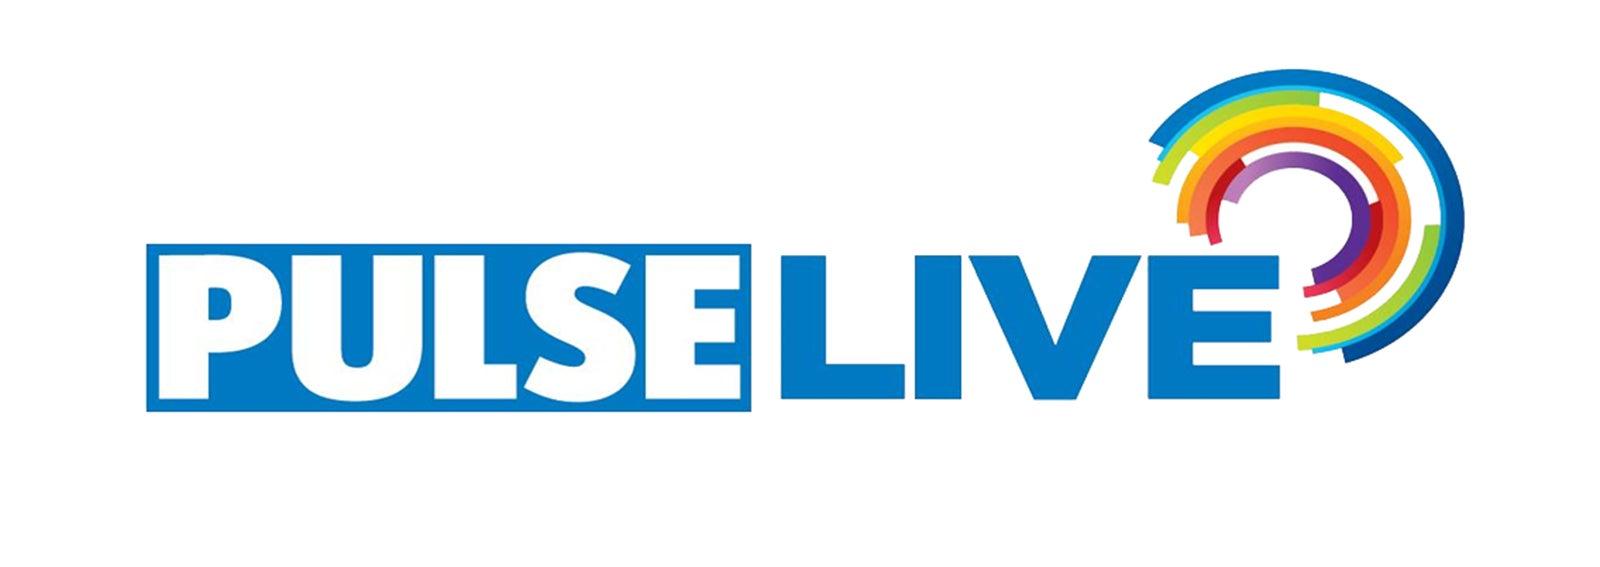 pulse_live_1600x567.jpg